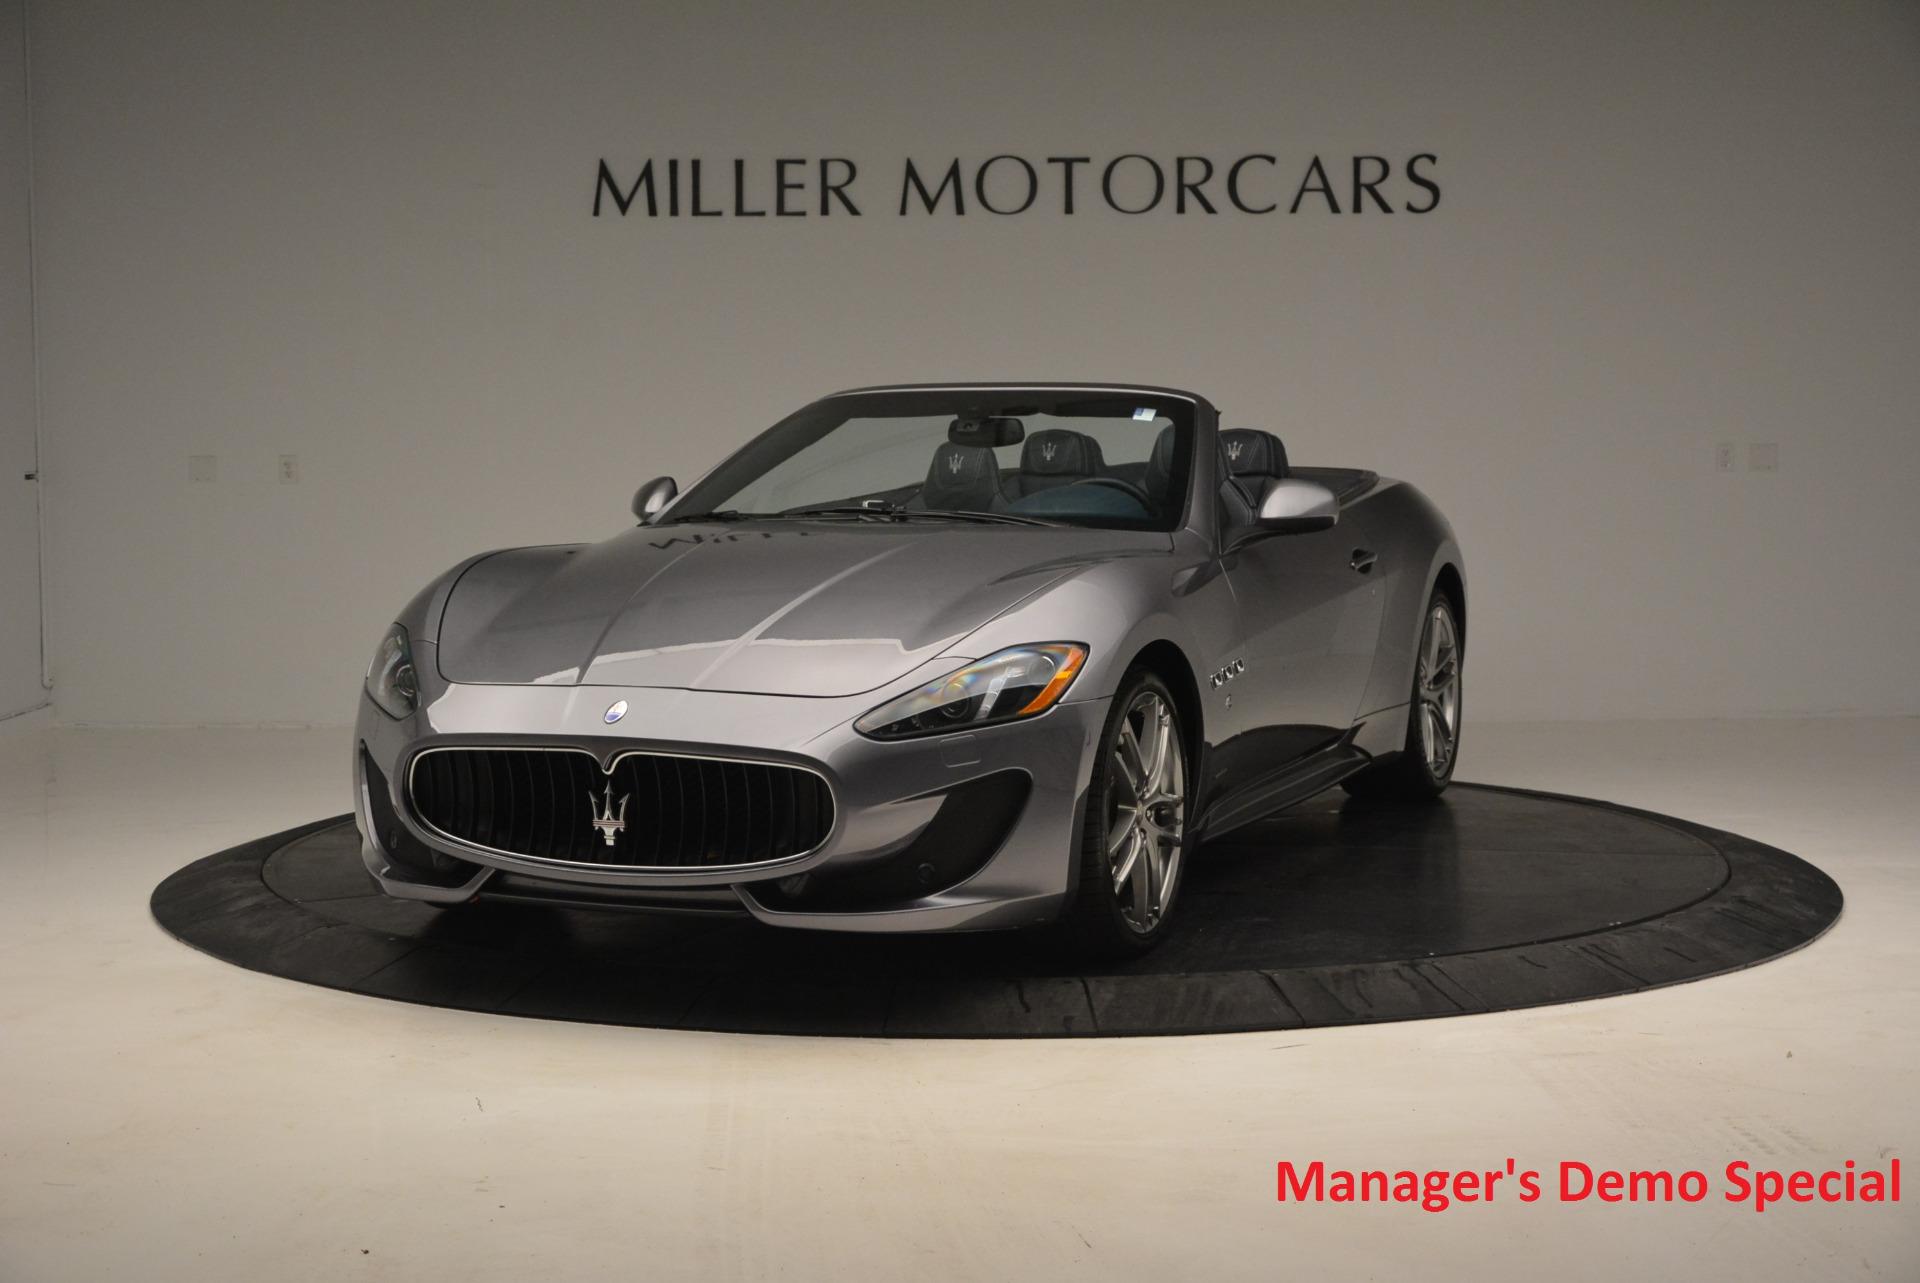 New 2016 Maserati GranTurismo Convertible Sport for sale Sold at Bentley Greenwich in Greenwich CT 06830 1